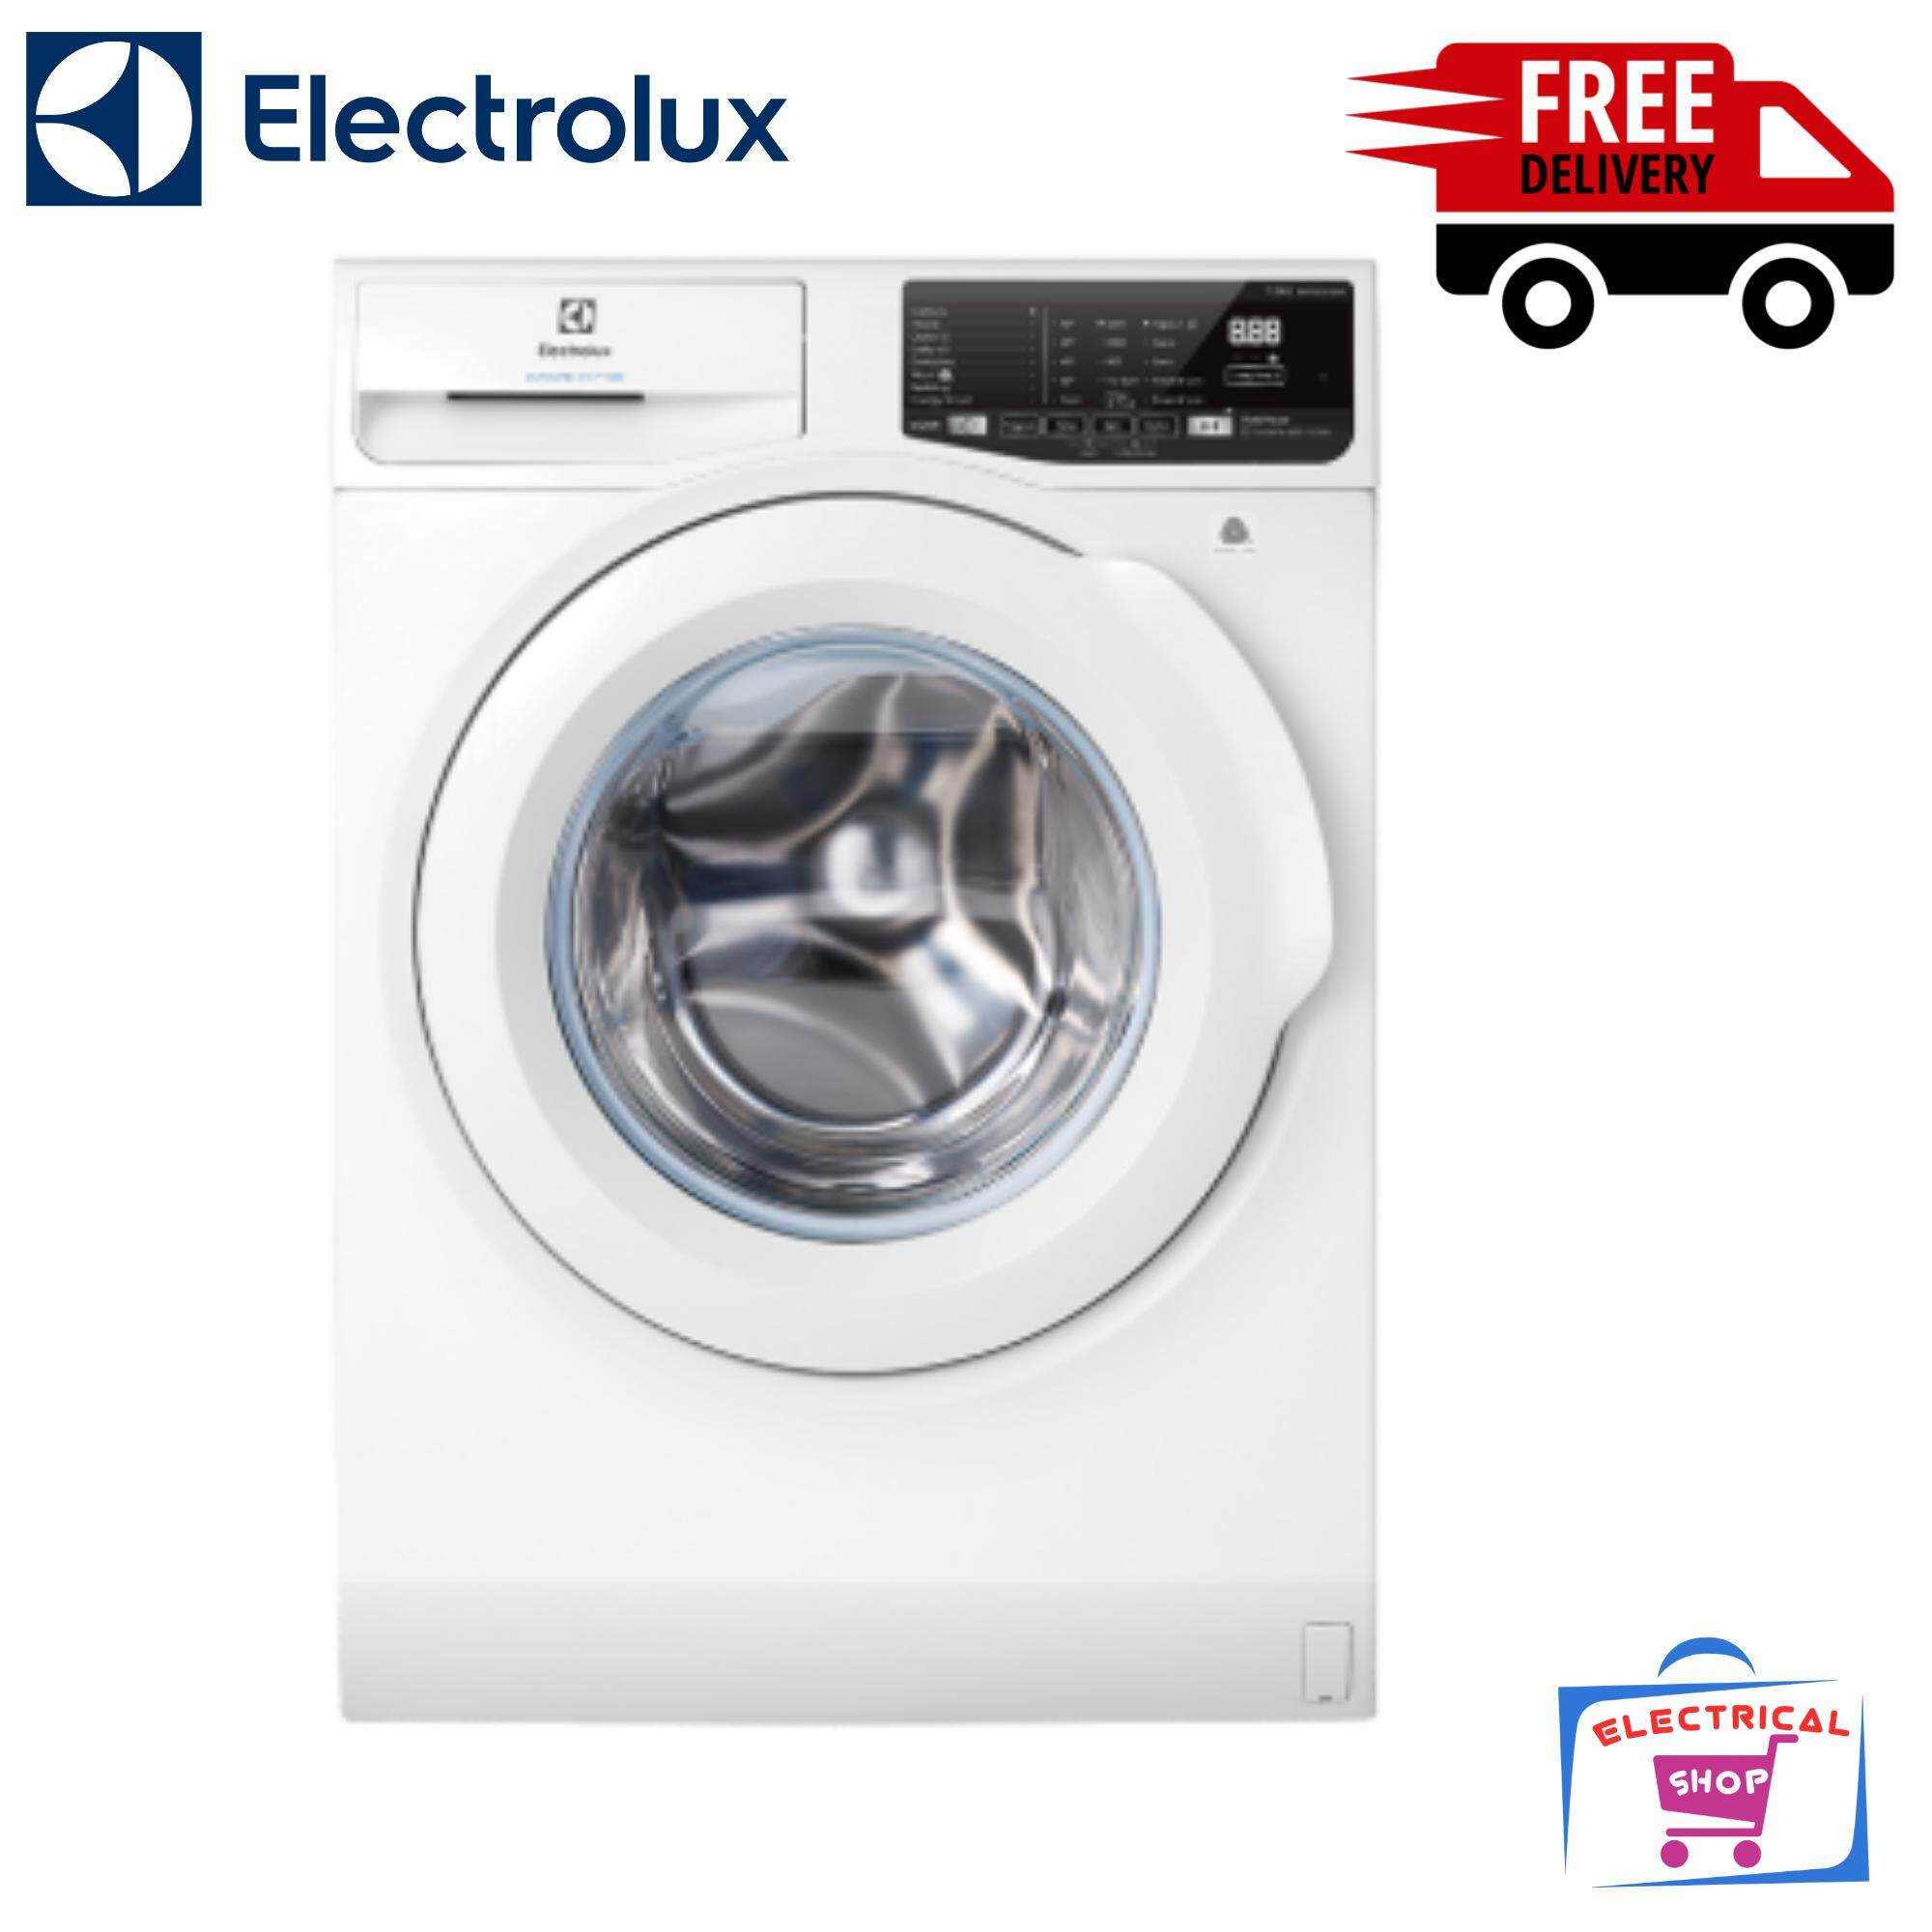 ELECTROLUX WASHING MACHINE EWF7525EQWA 7.5kg New 2018 washer